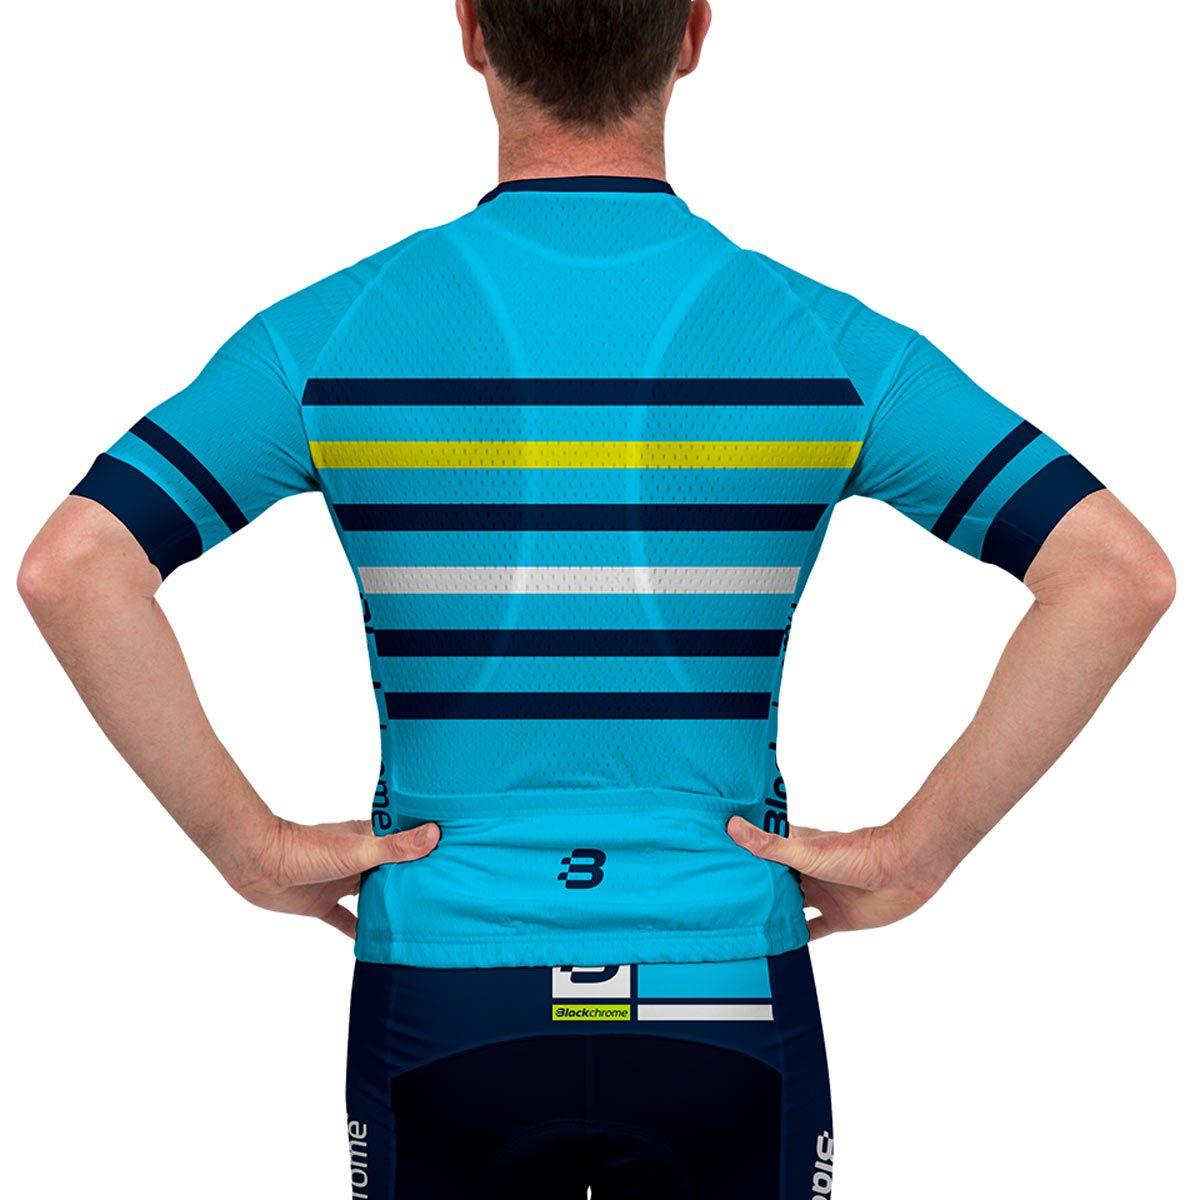 Mens rails pro fit jersey blue blackchrome for Fishing sponsor shirts